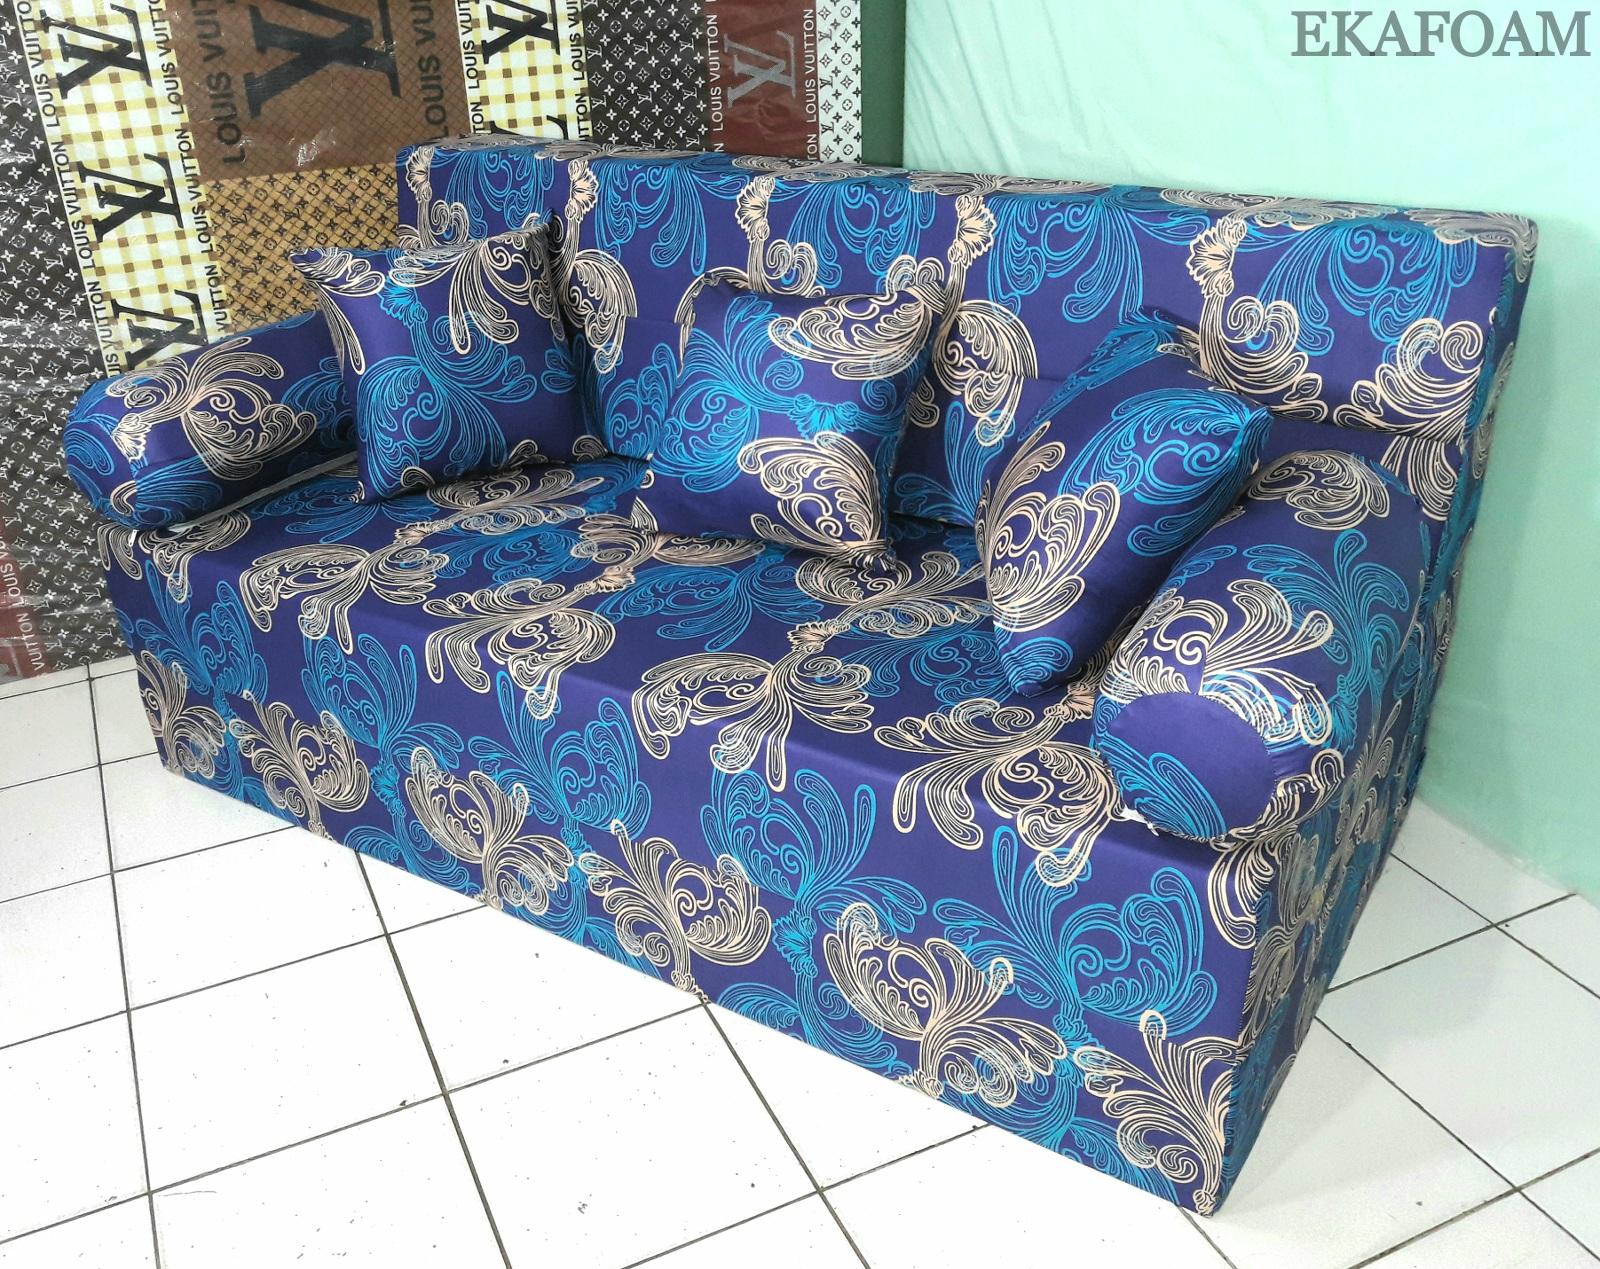 harga sofa bed inoac no 1 house of reeves leather sofas terbaru 2017 agen jual kasur busa